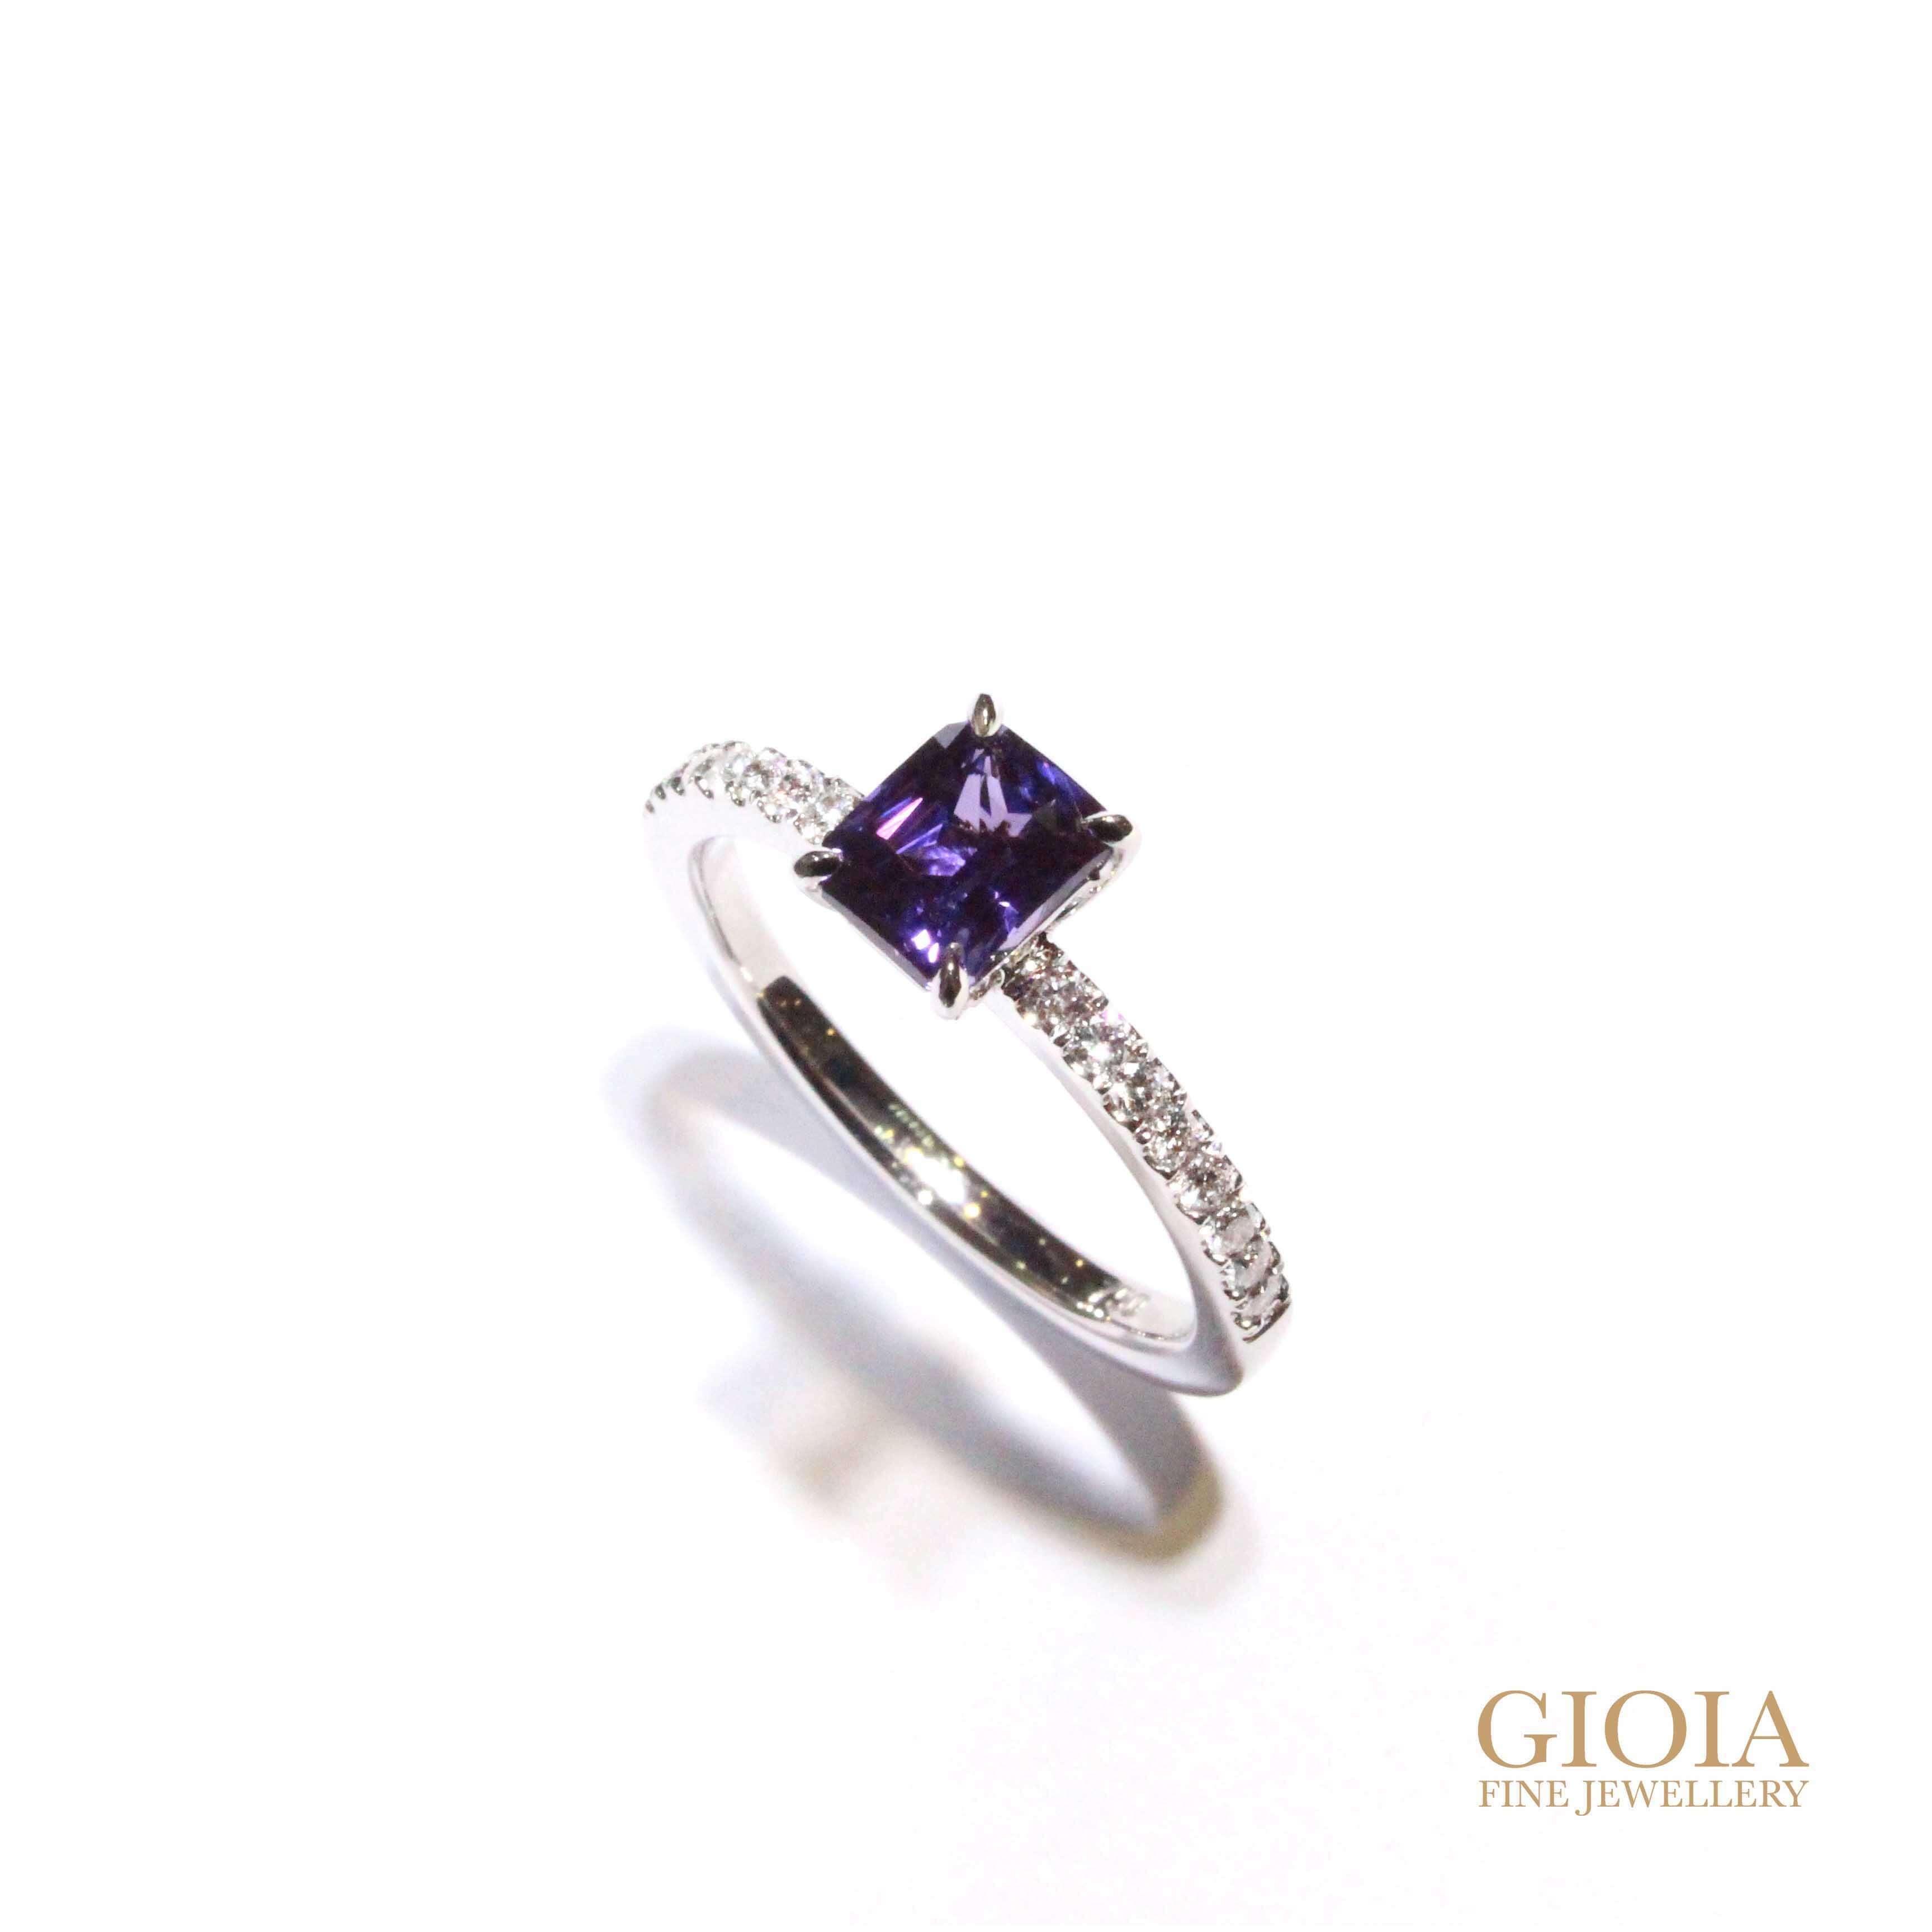 customised sapphire engagement ring - Custom made Jewellery GIOIA Fine Jewellery